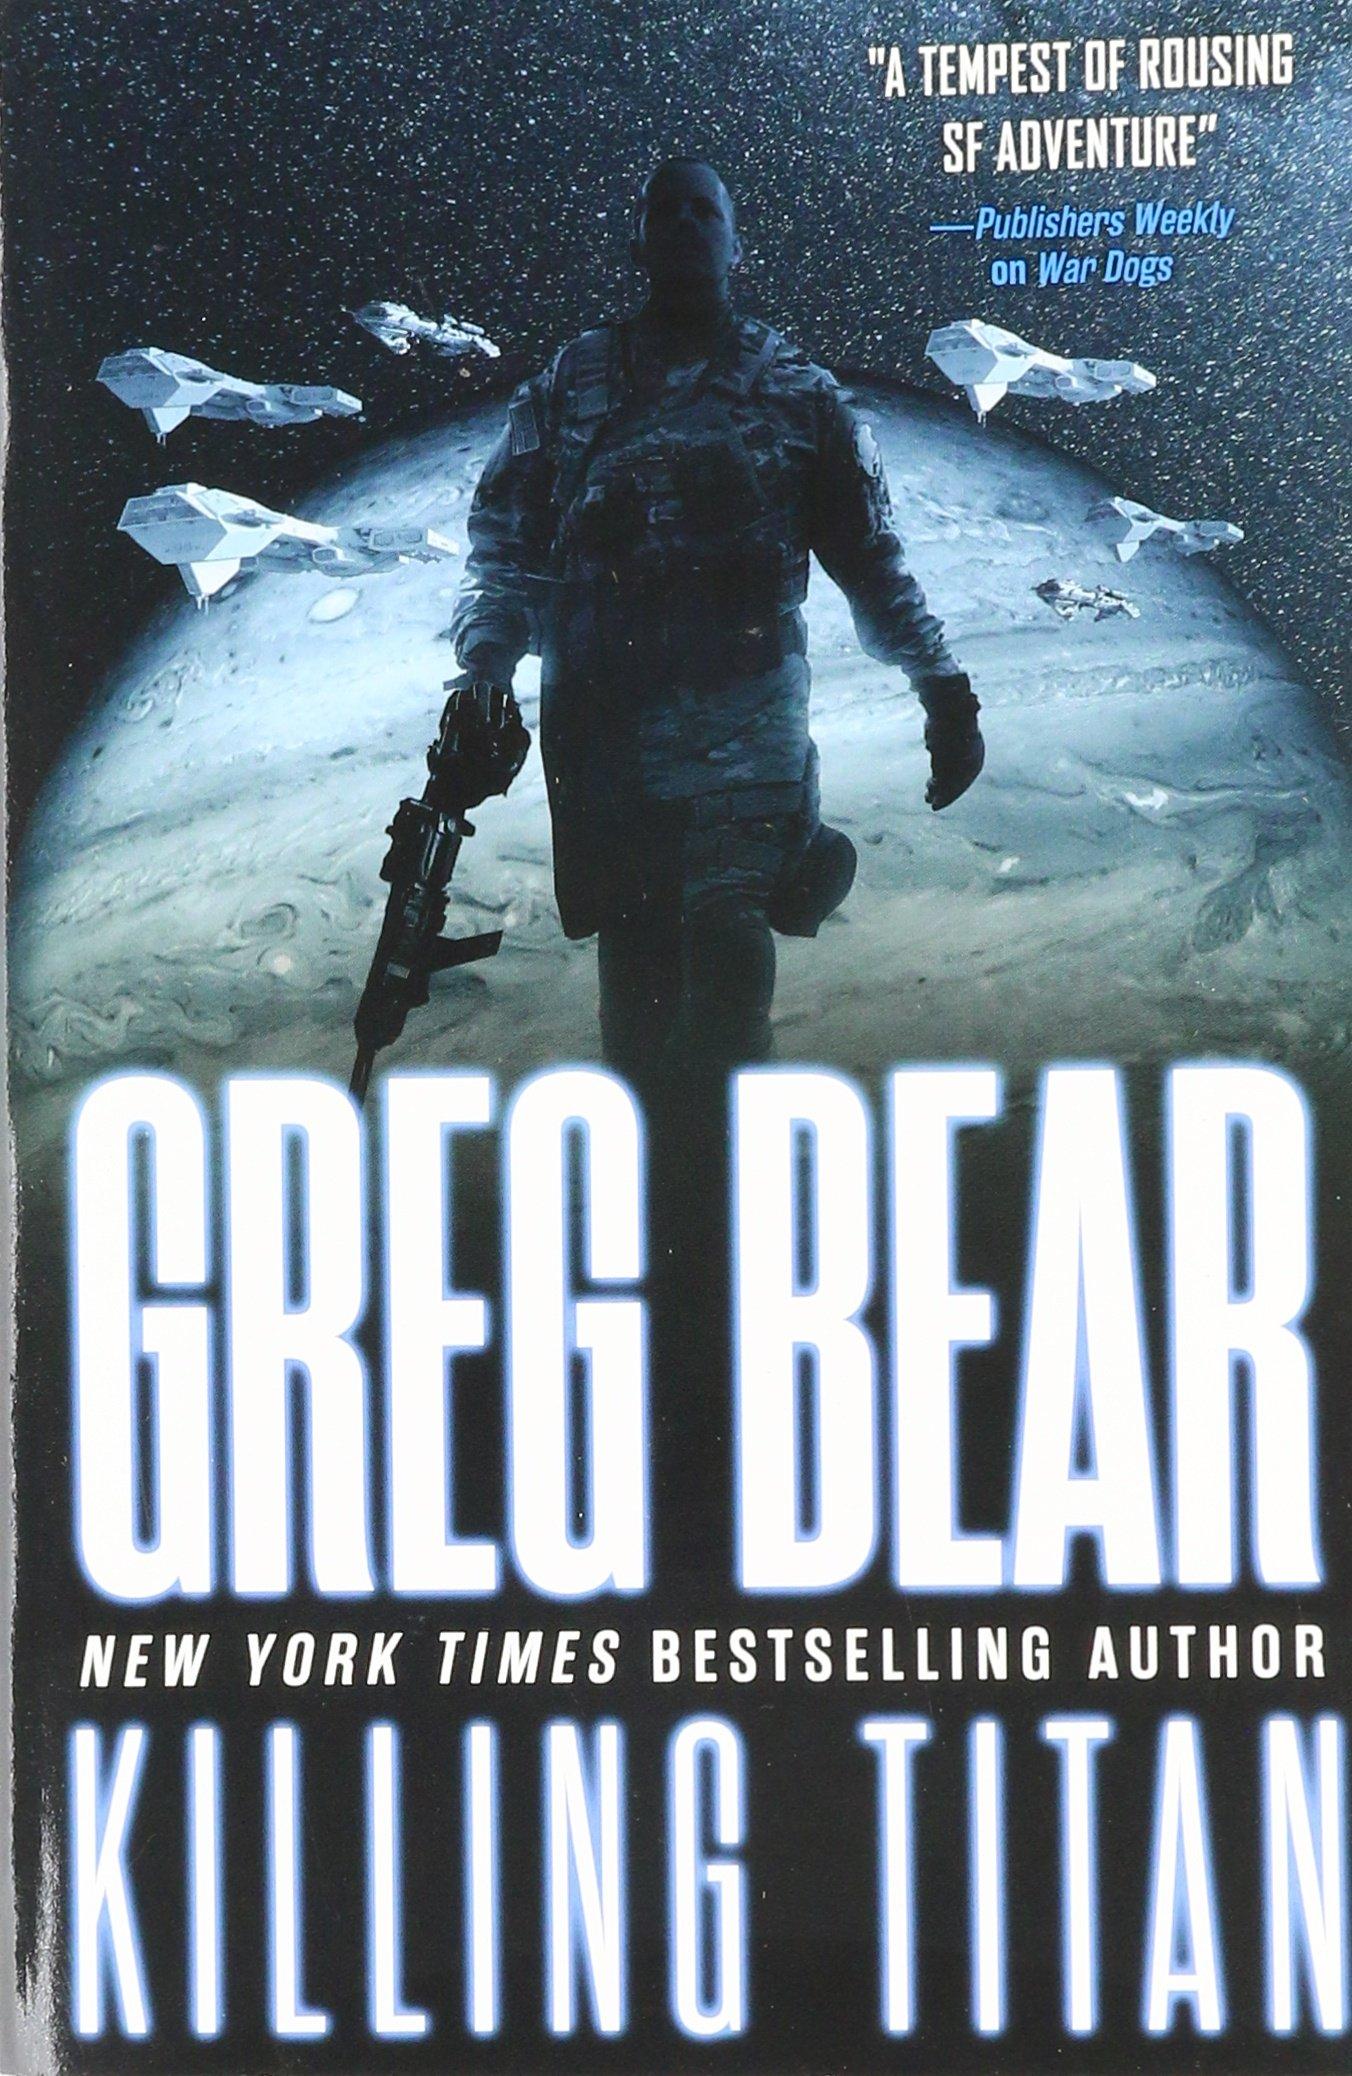 Killing Titan Dogs Greg Bear